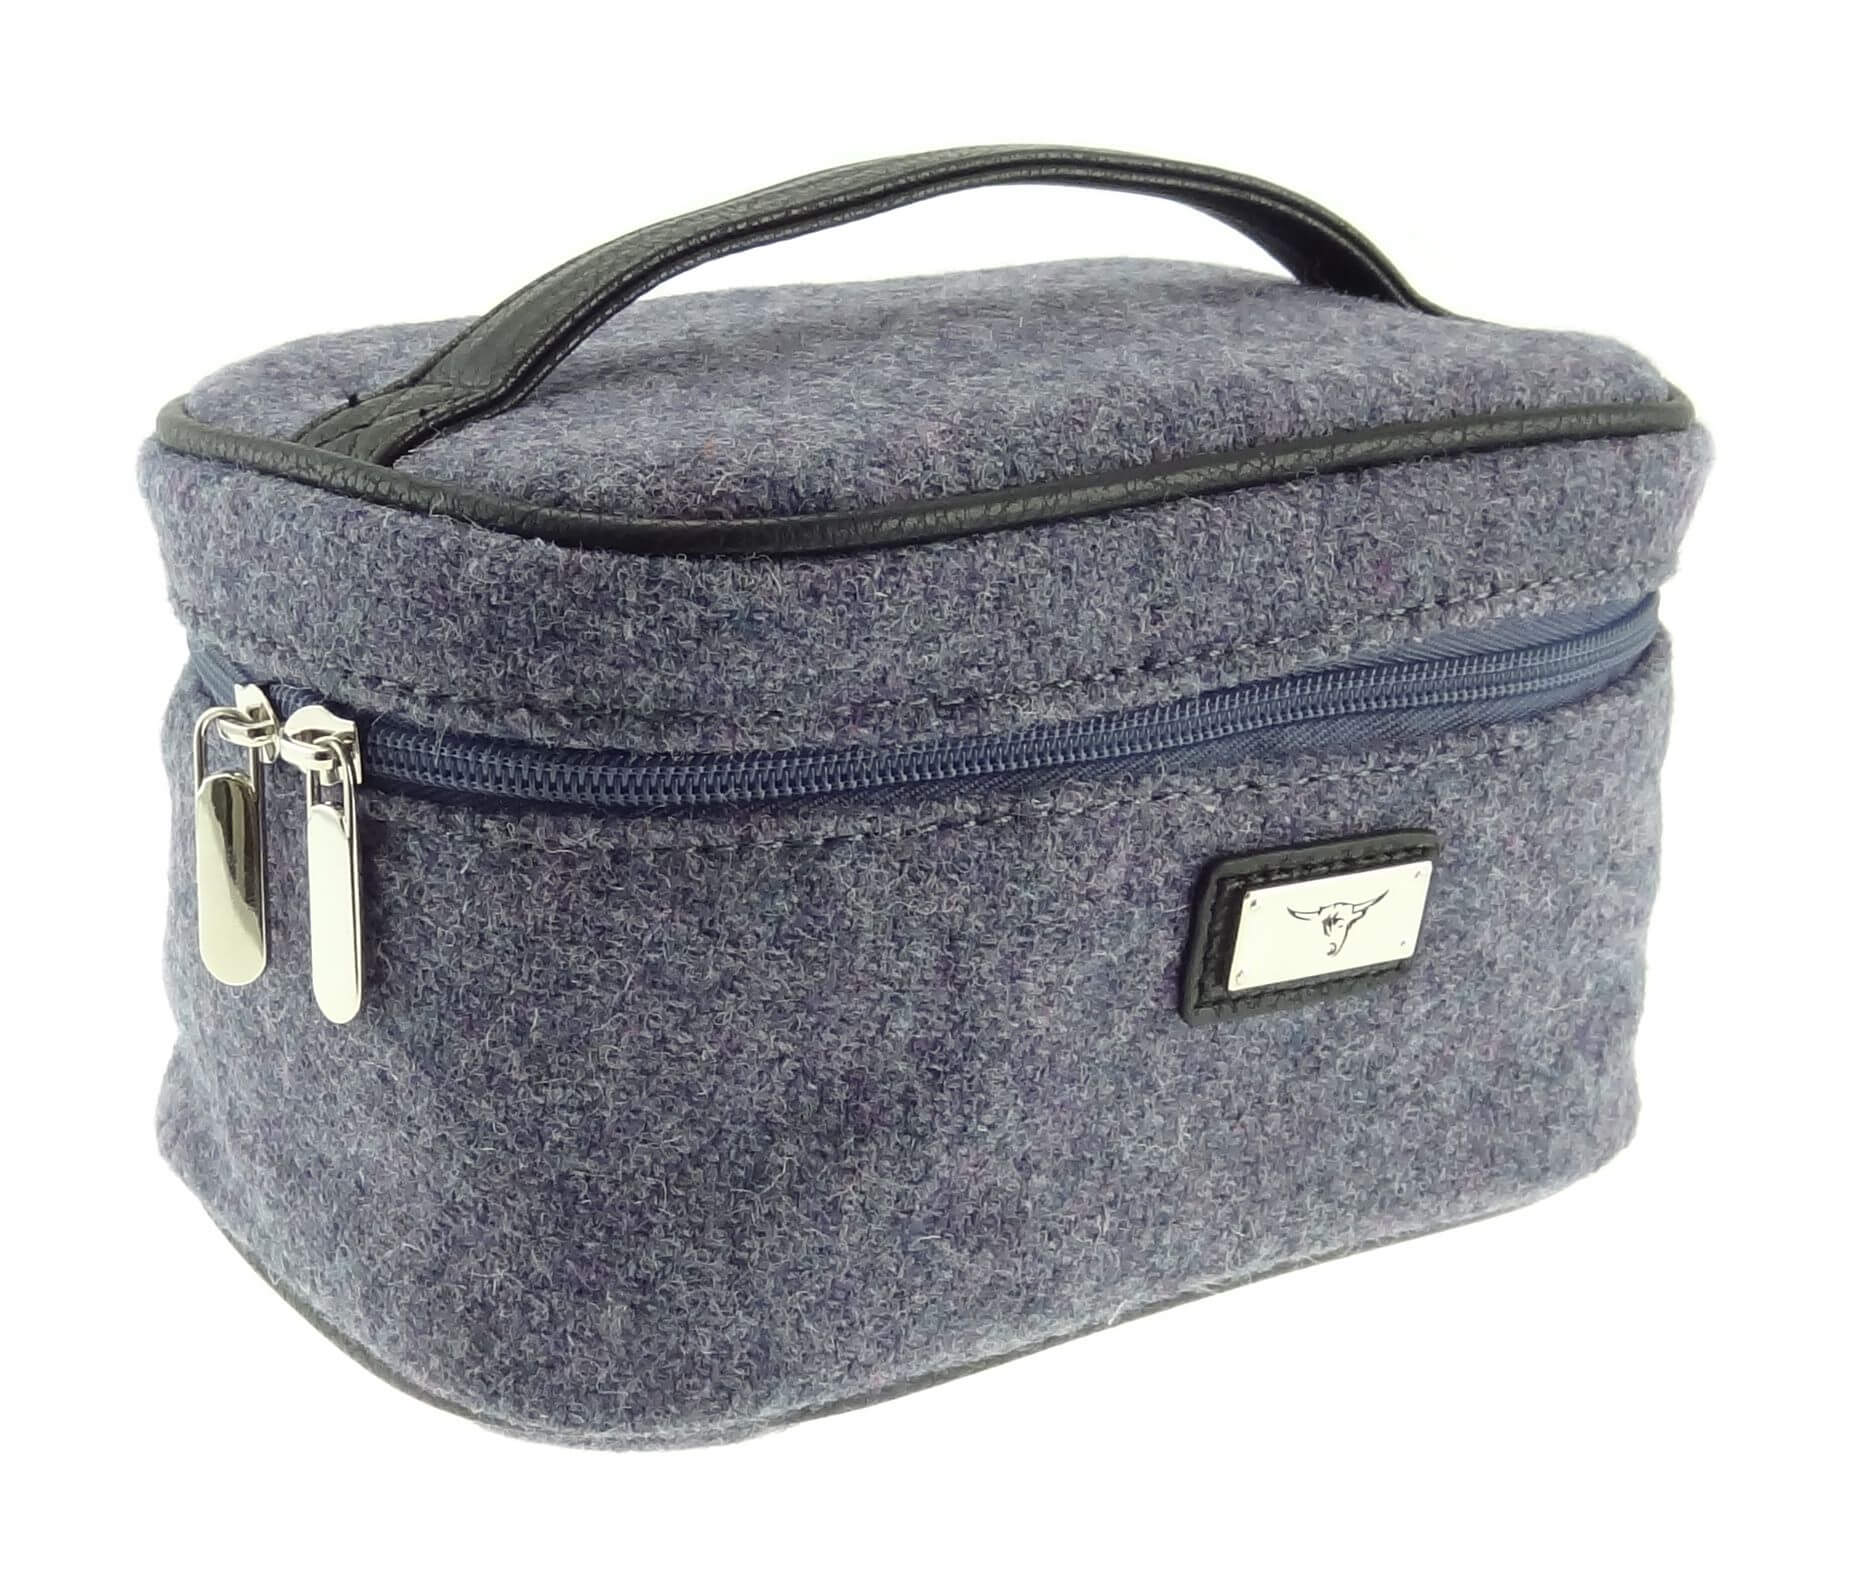 Harris Tweed Cosmetic Bag LB2103-COL38